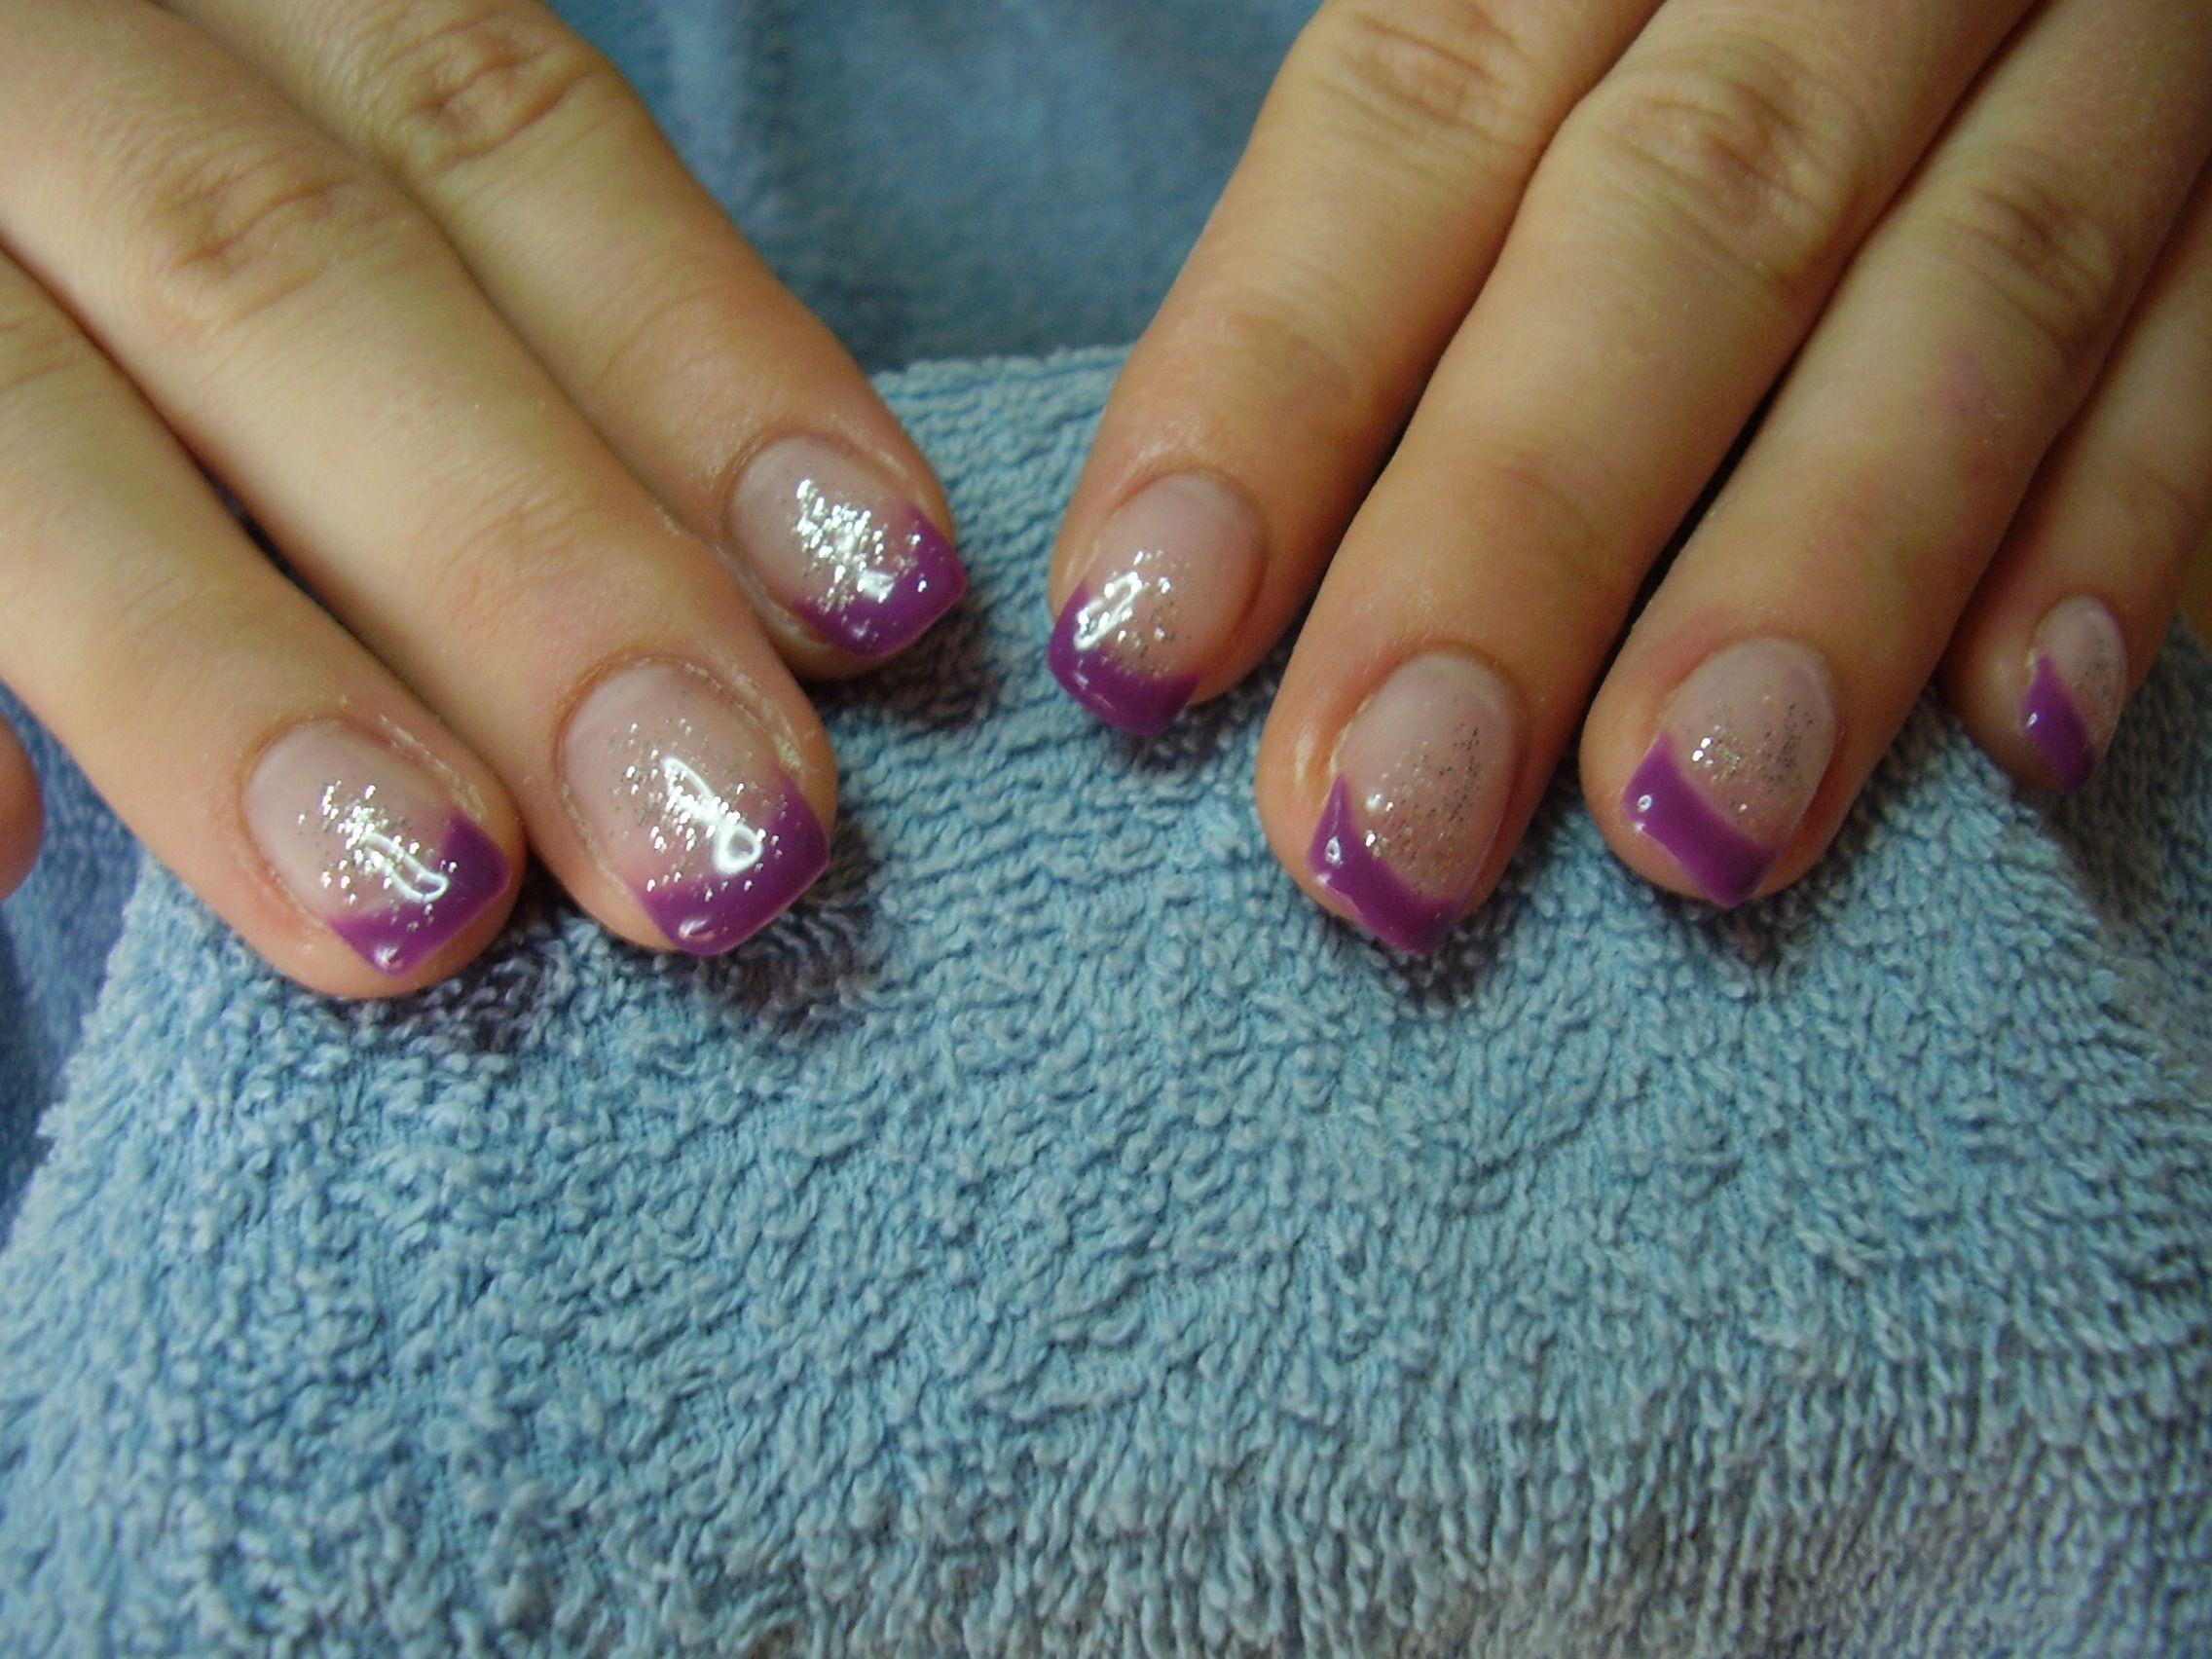 gel nails - purple